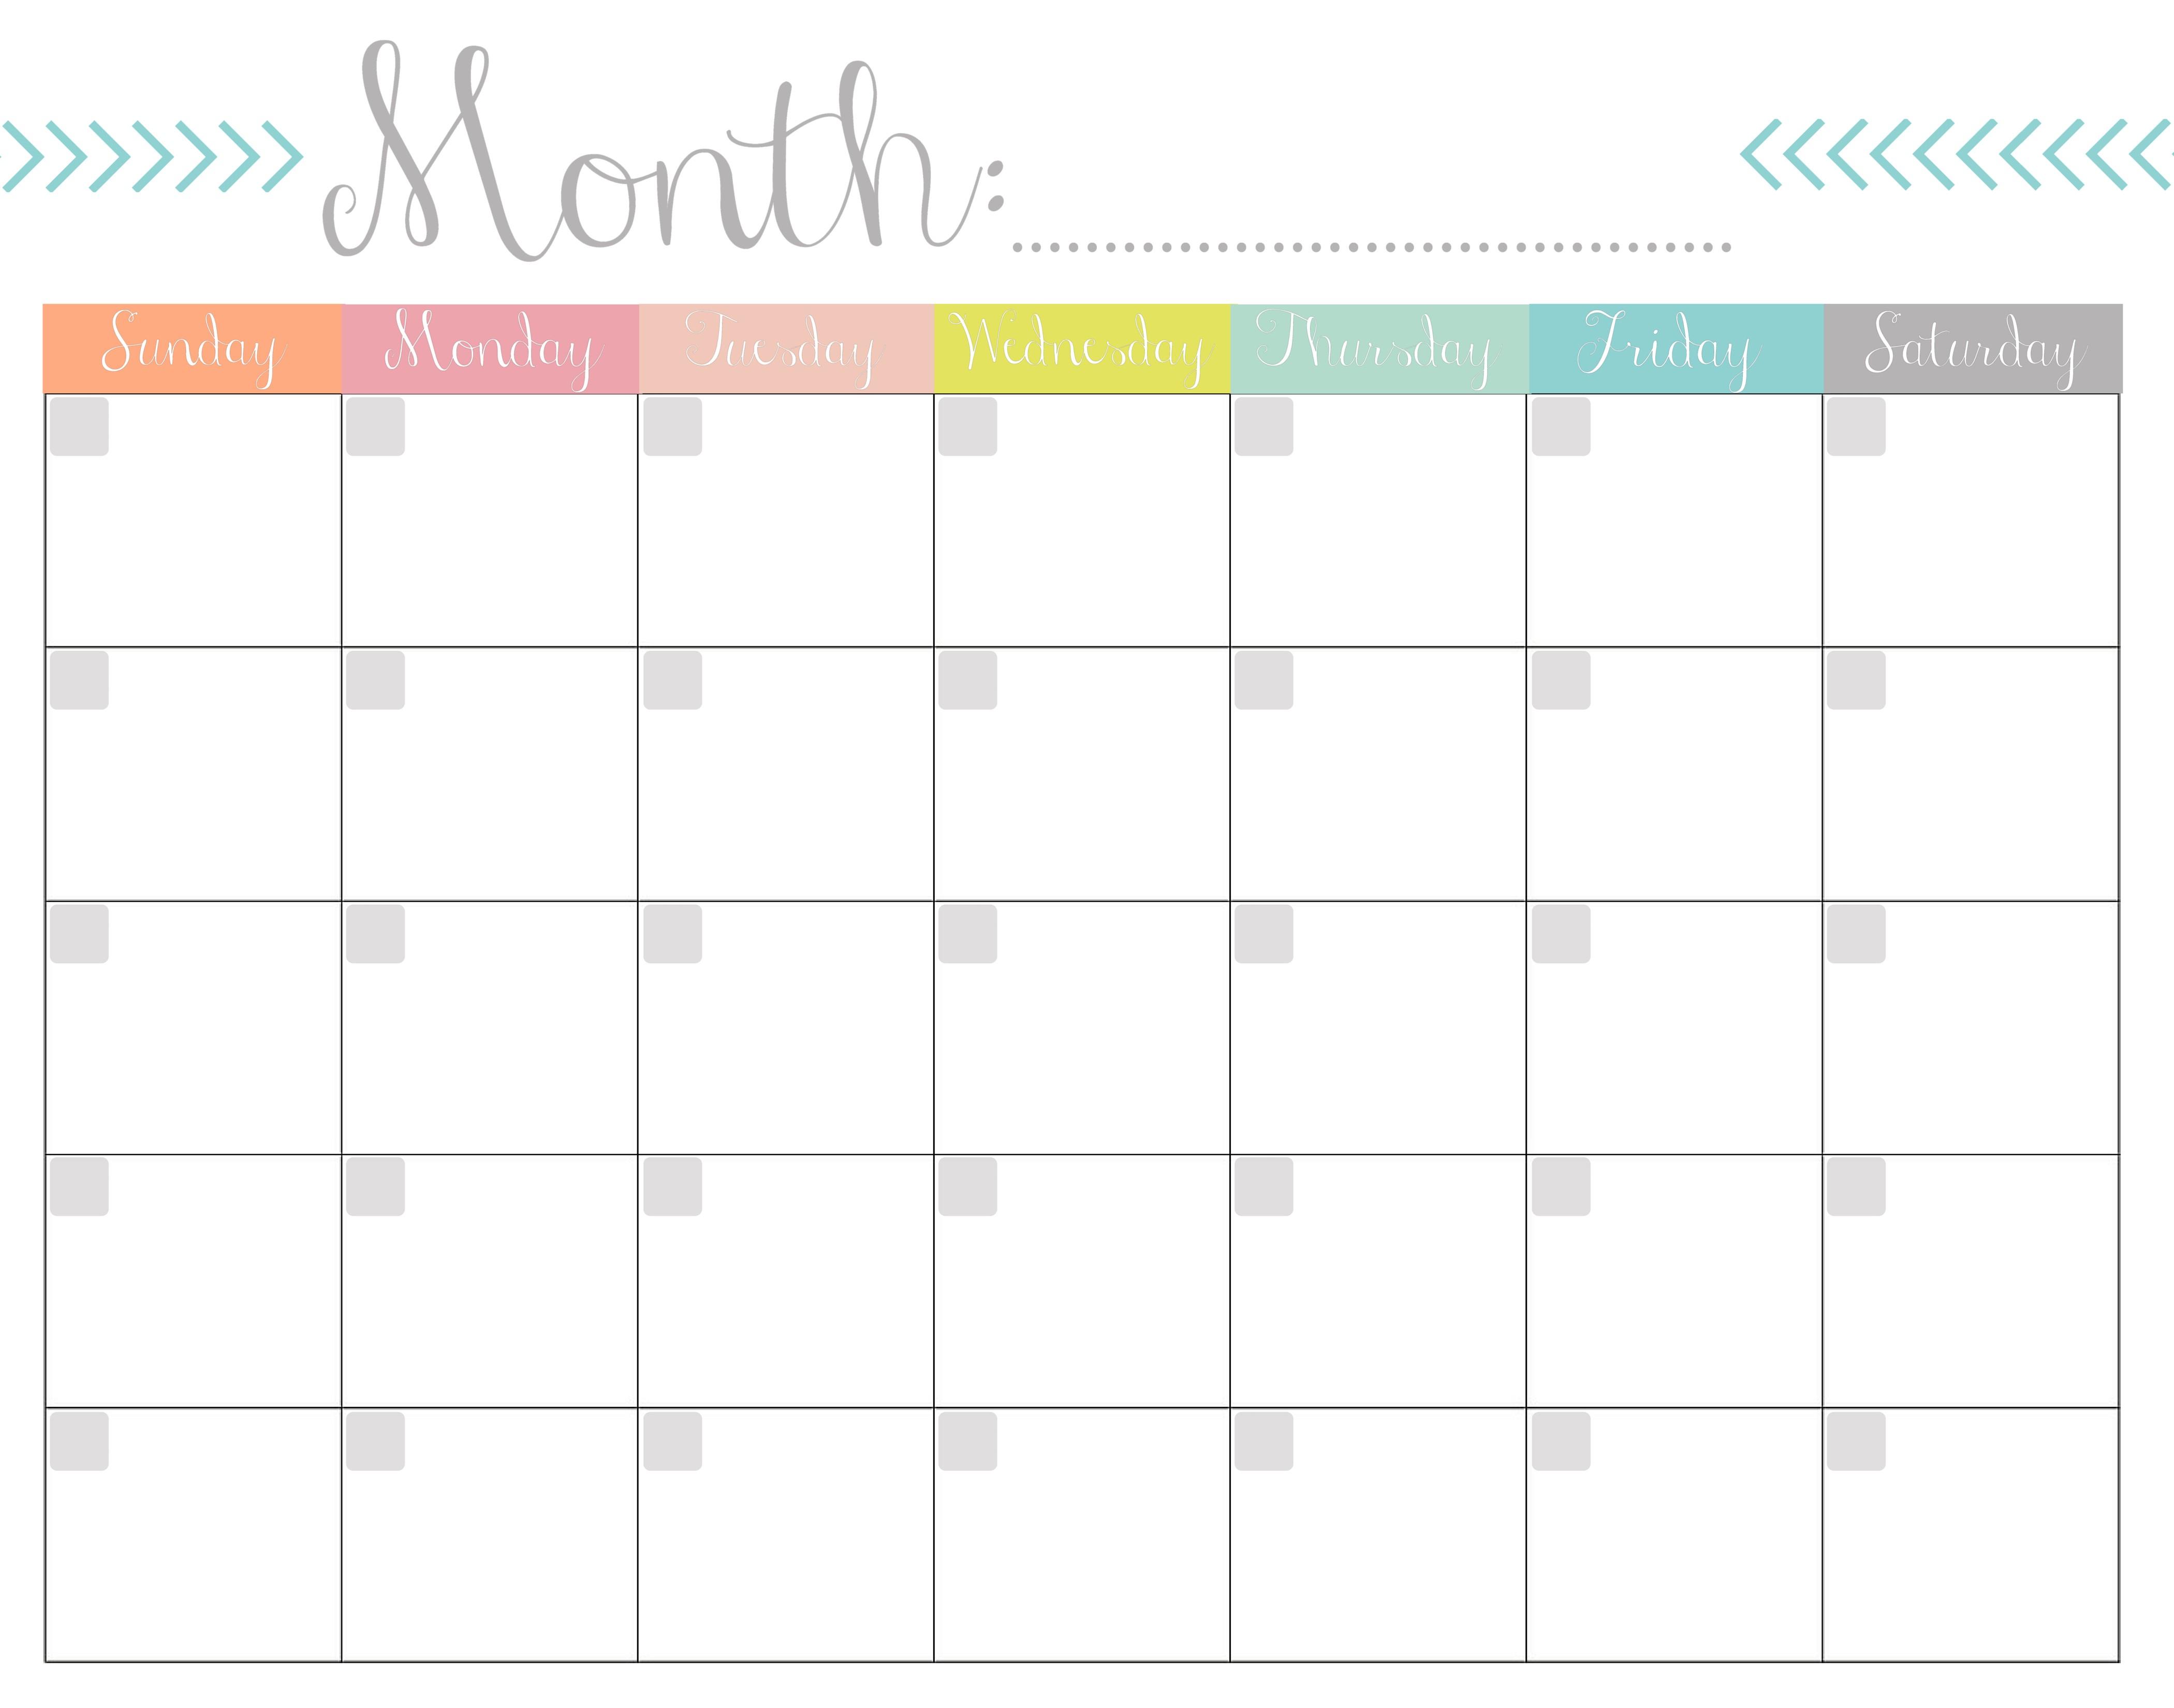 Calendar Printable Monthly Monthly Calendar Free Printable